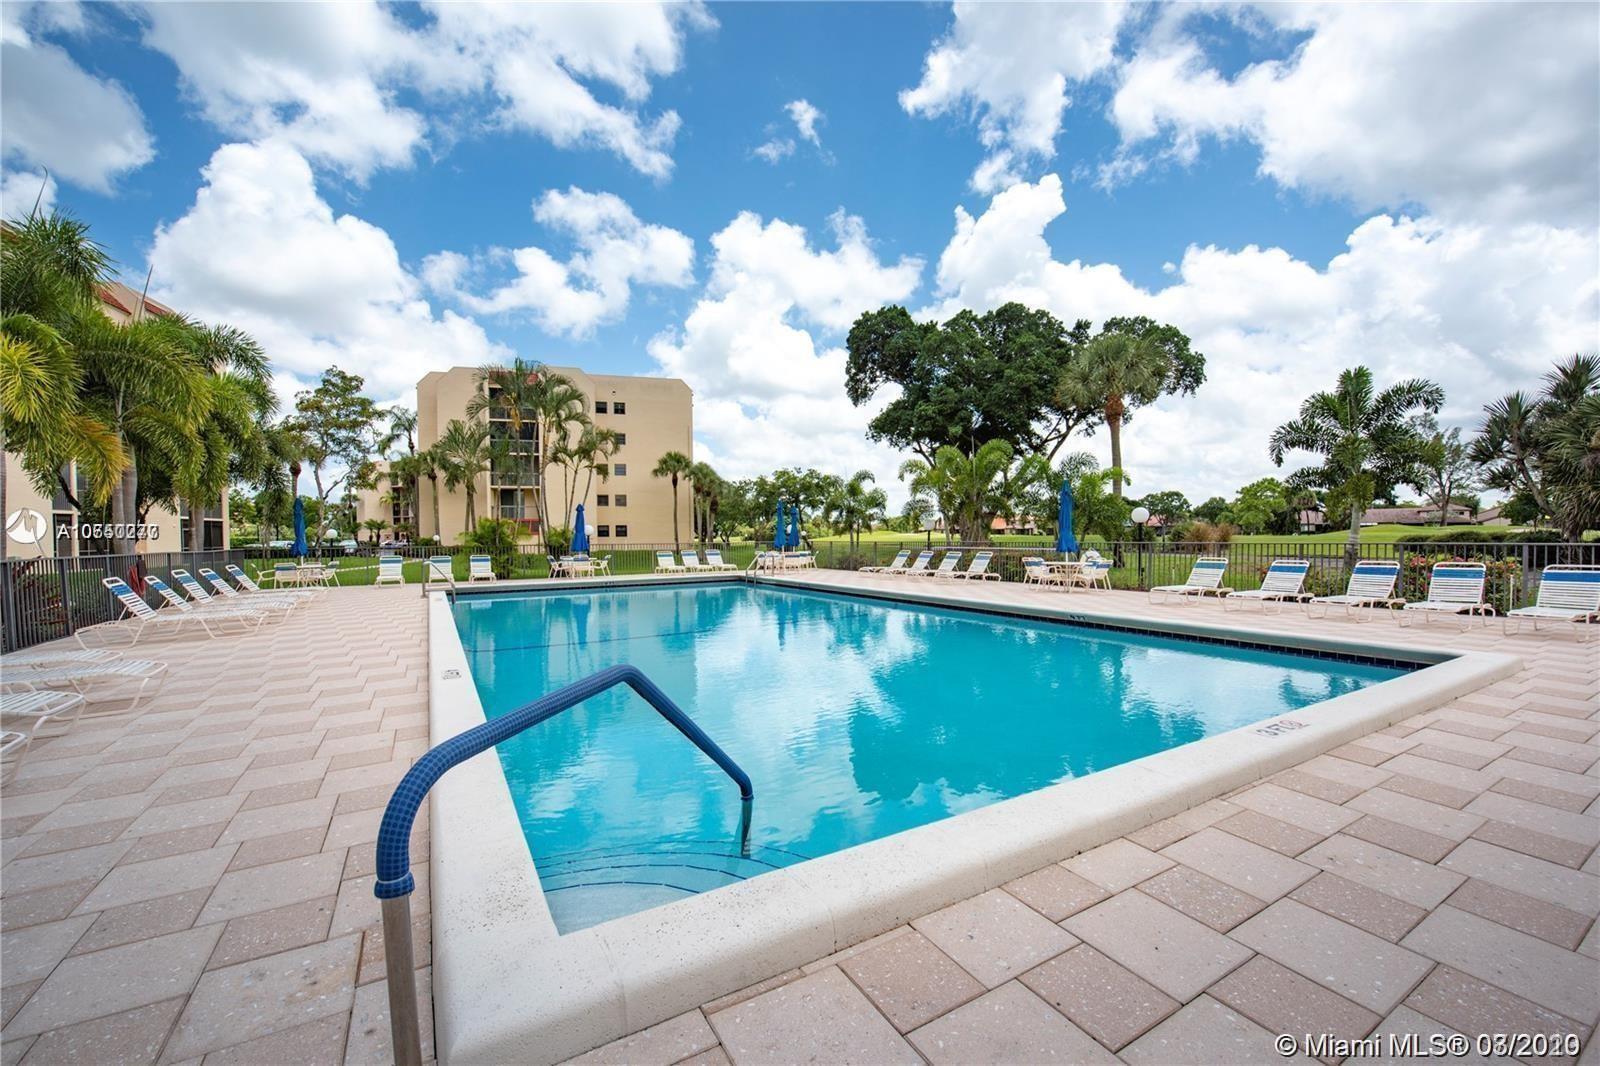 3771 Environ Blvd # 154, Lauderhill, Florida 33319, 1 Bedroom Bedrooms, ,2 BathroomsBathrooms,Residential,For Sale,3771 Environ Blvd # 154,A10750277